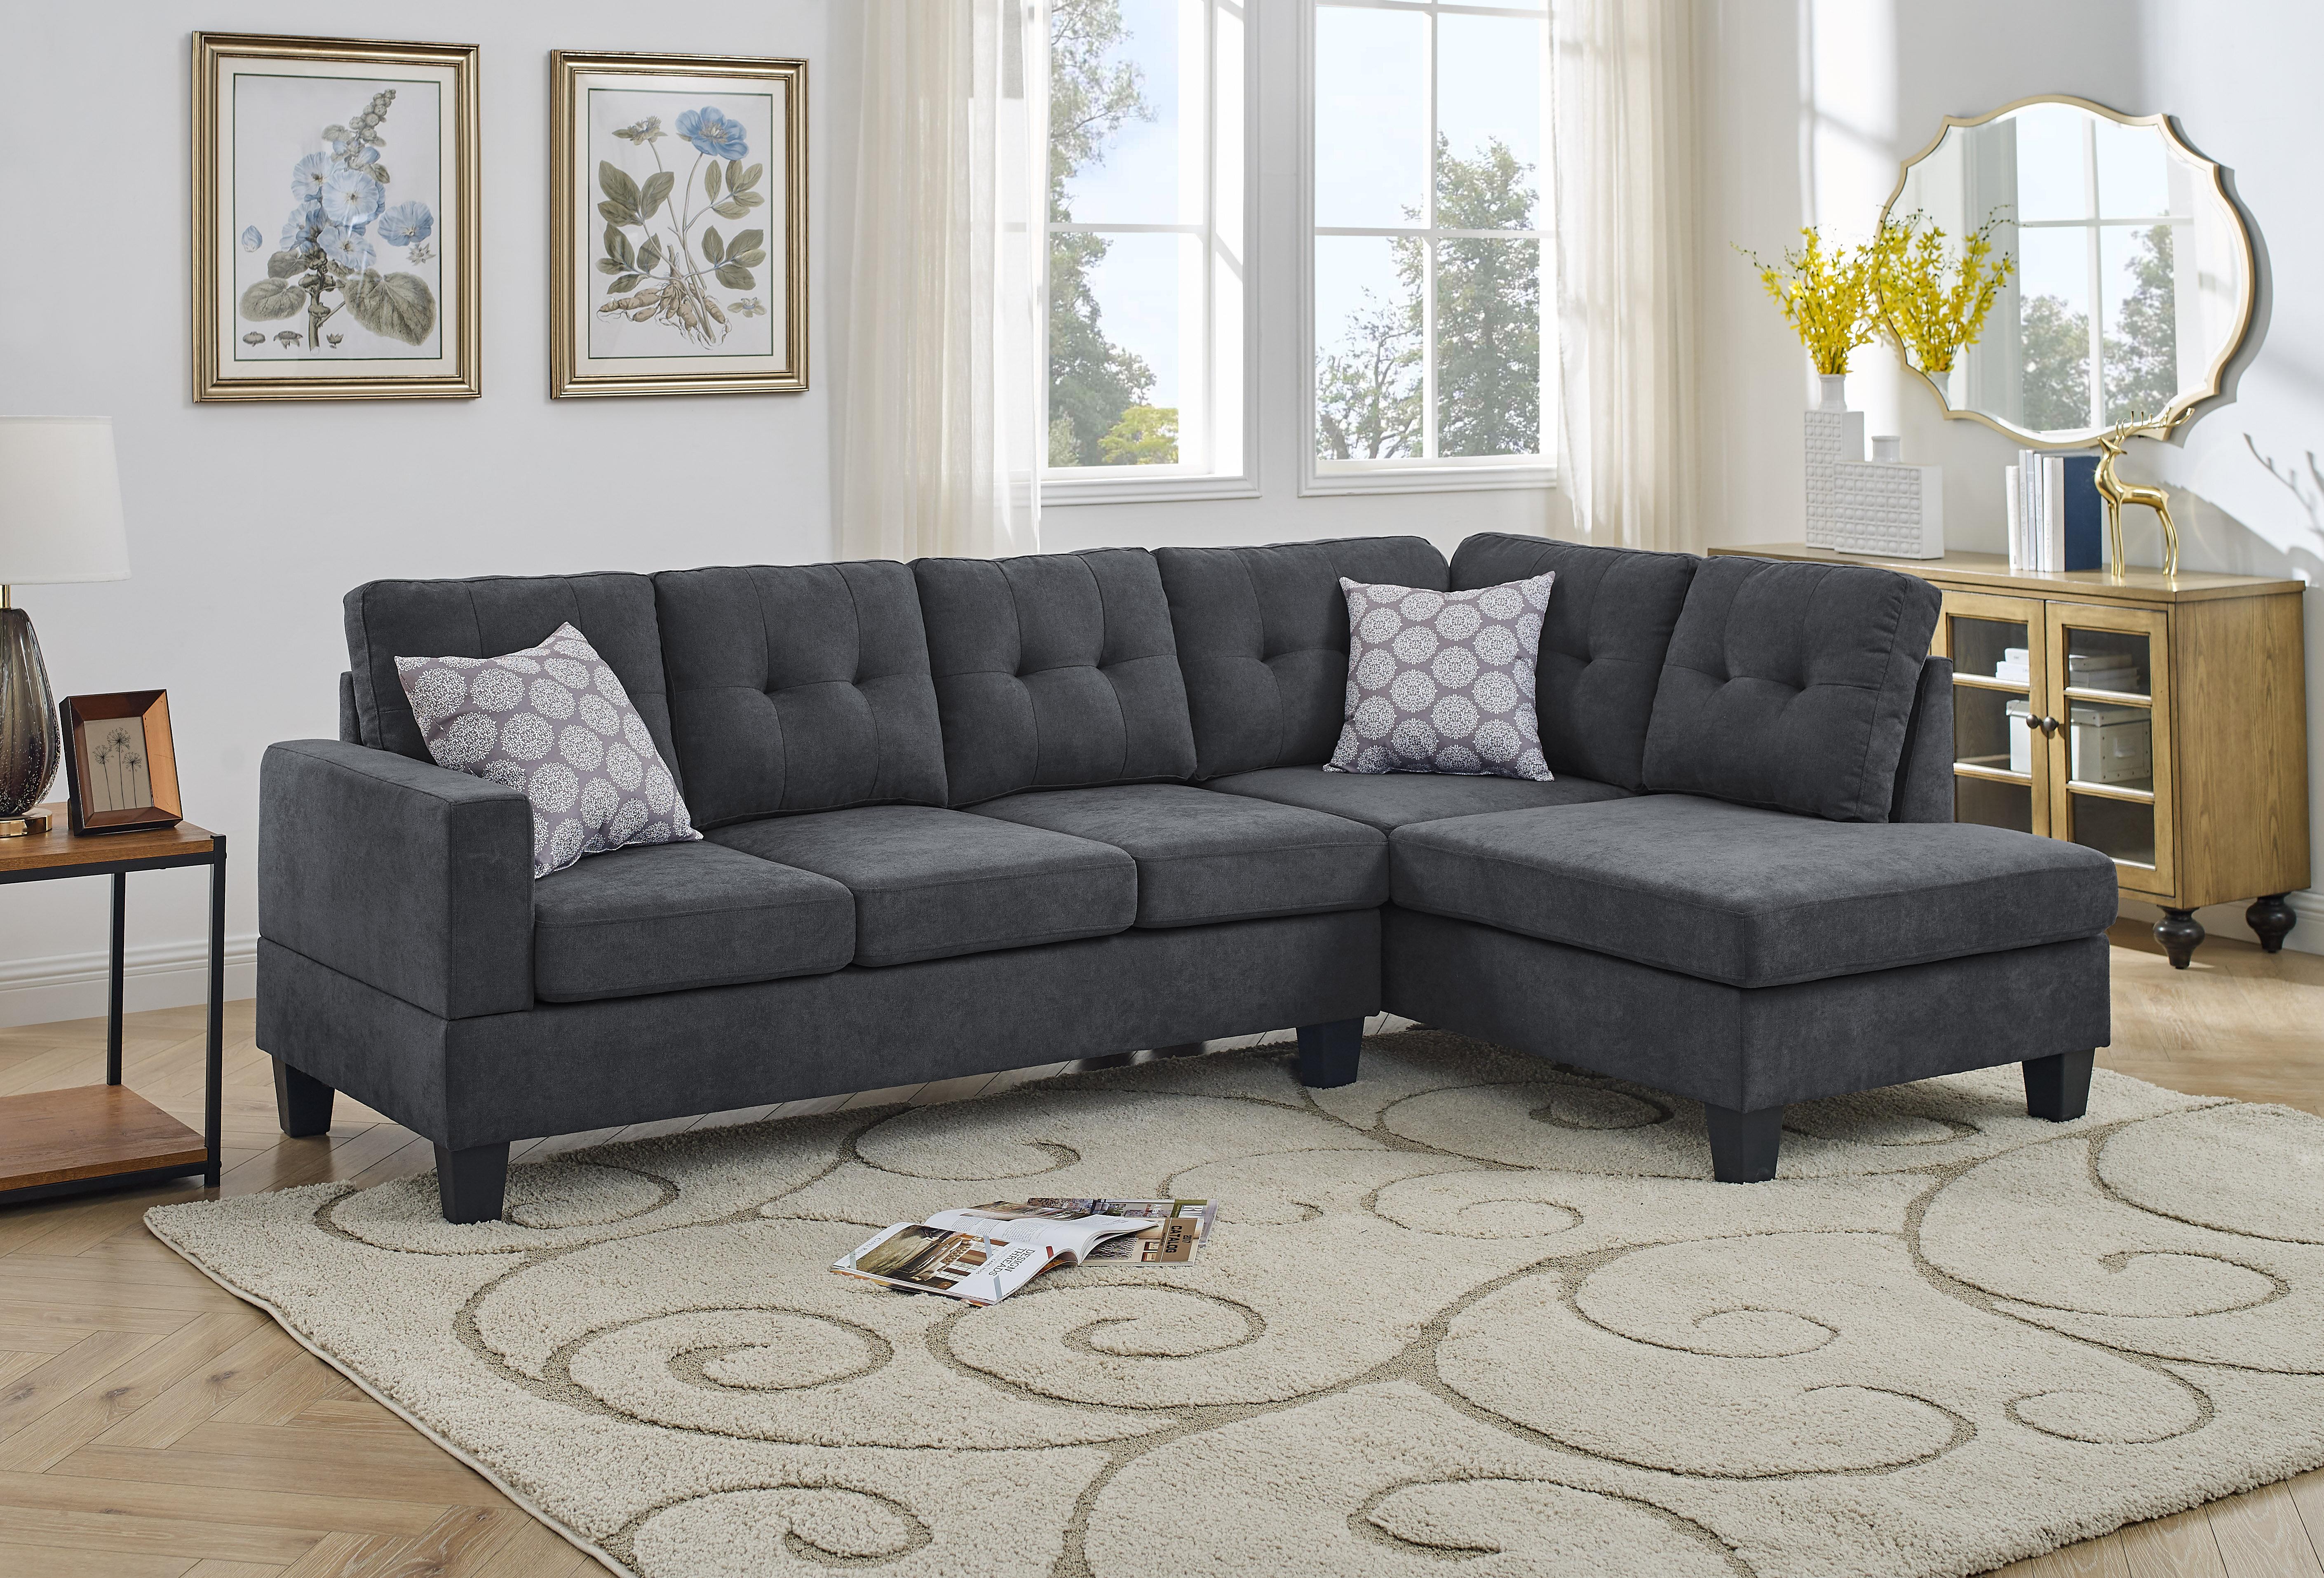 Ebern Designs Adryel 98 Wide Microfiber Microsuede Right Hand Facing Sofa Chaise Reviews Wayfair